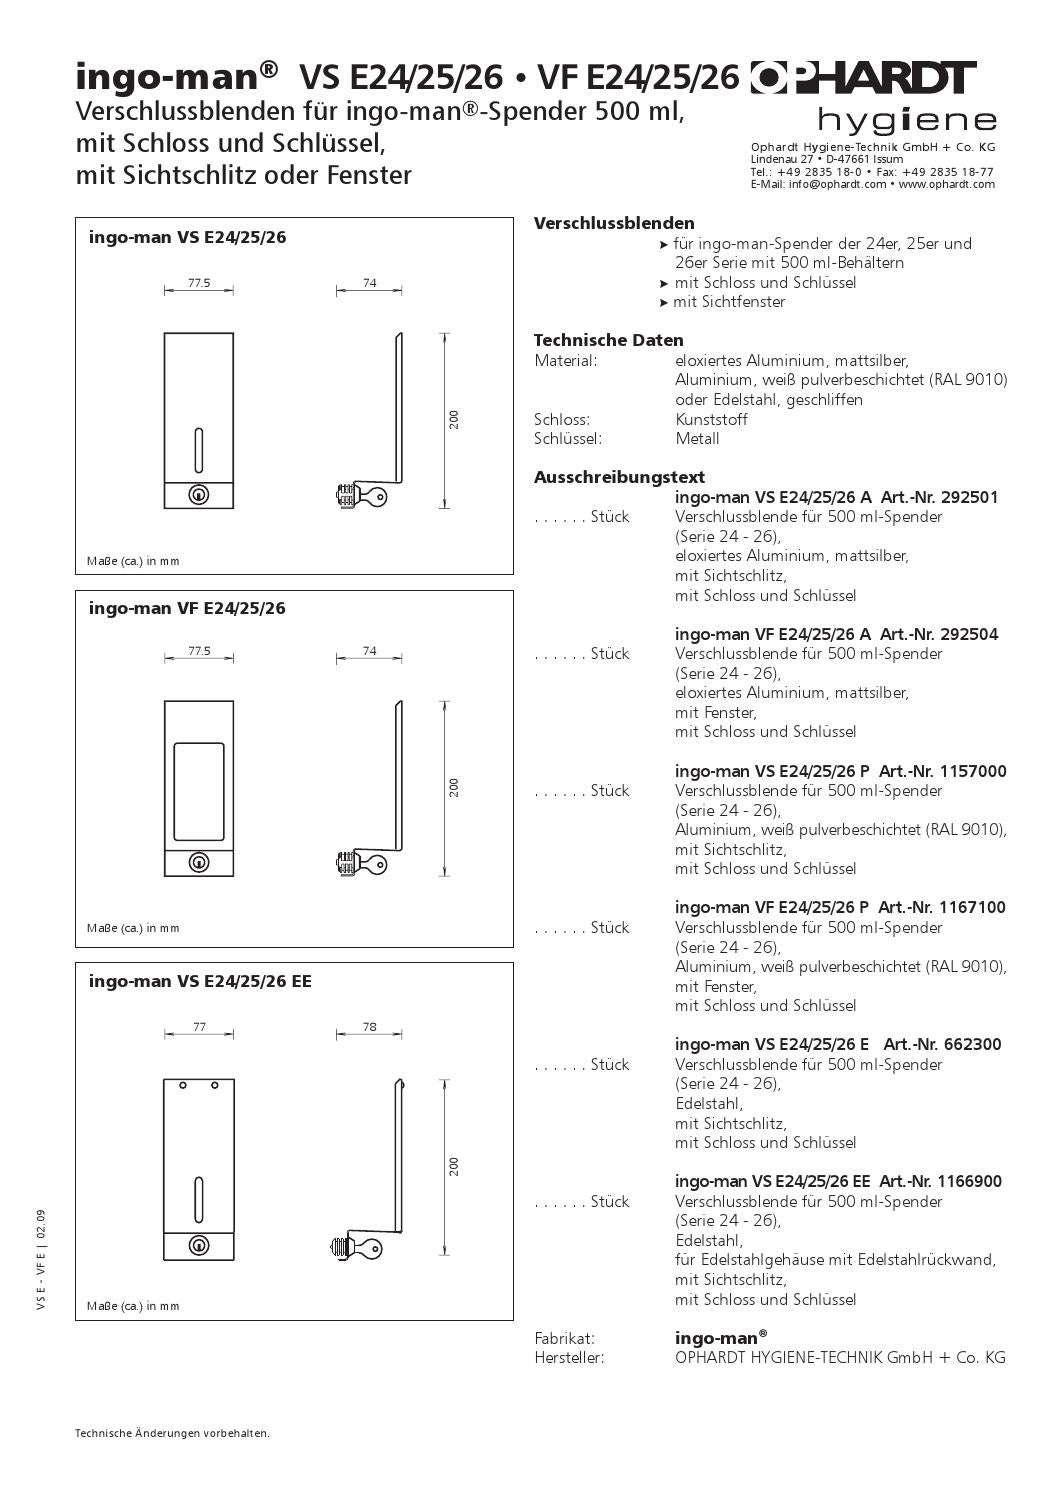 ingo man vs e 26 vf e 26 by heroshygiene issuu. Black Bedroom Furniture Sets. Home Design Ideas